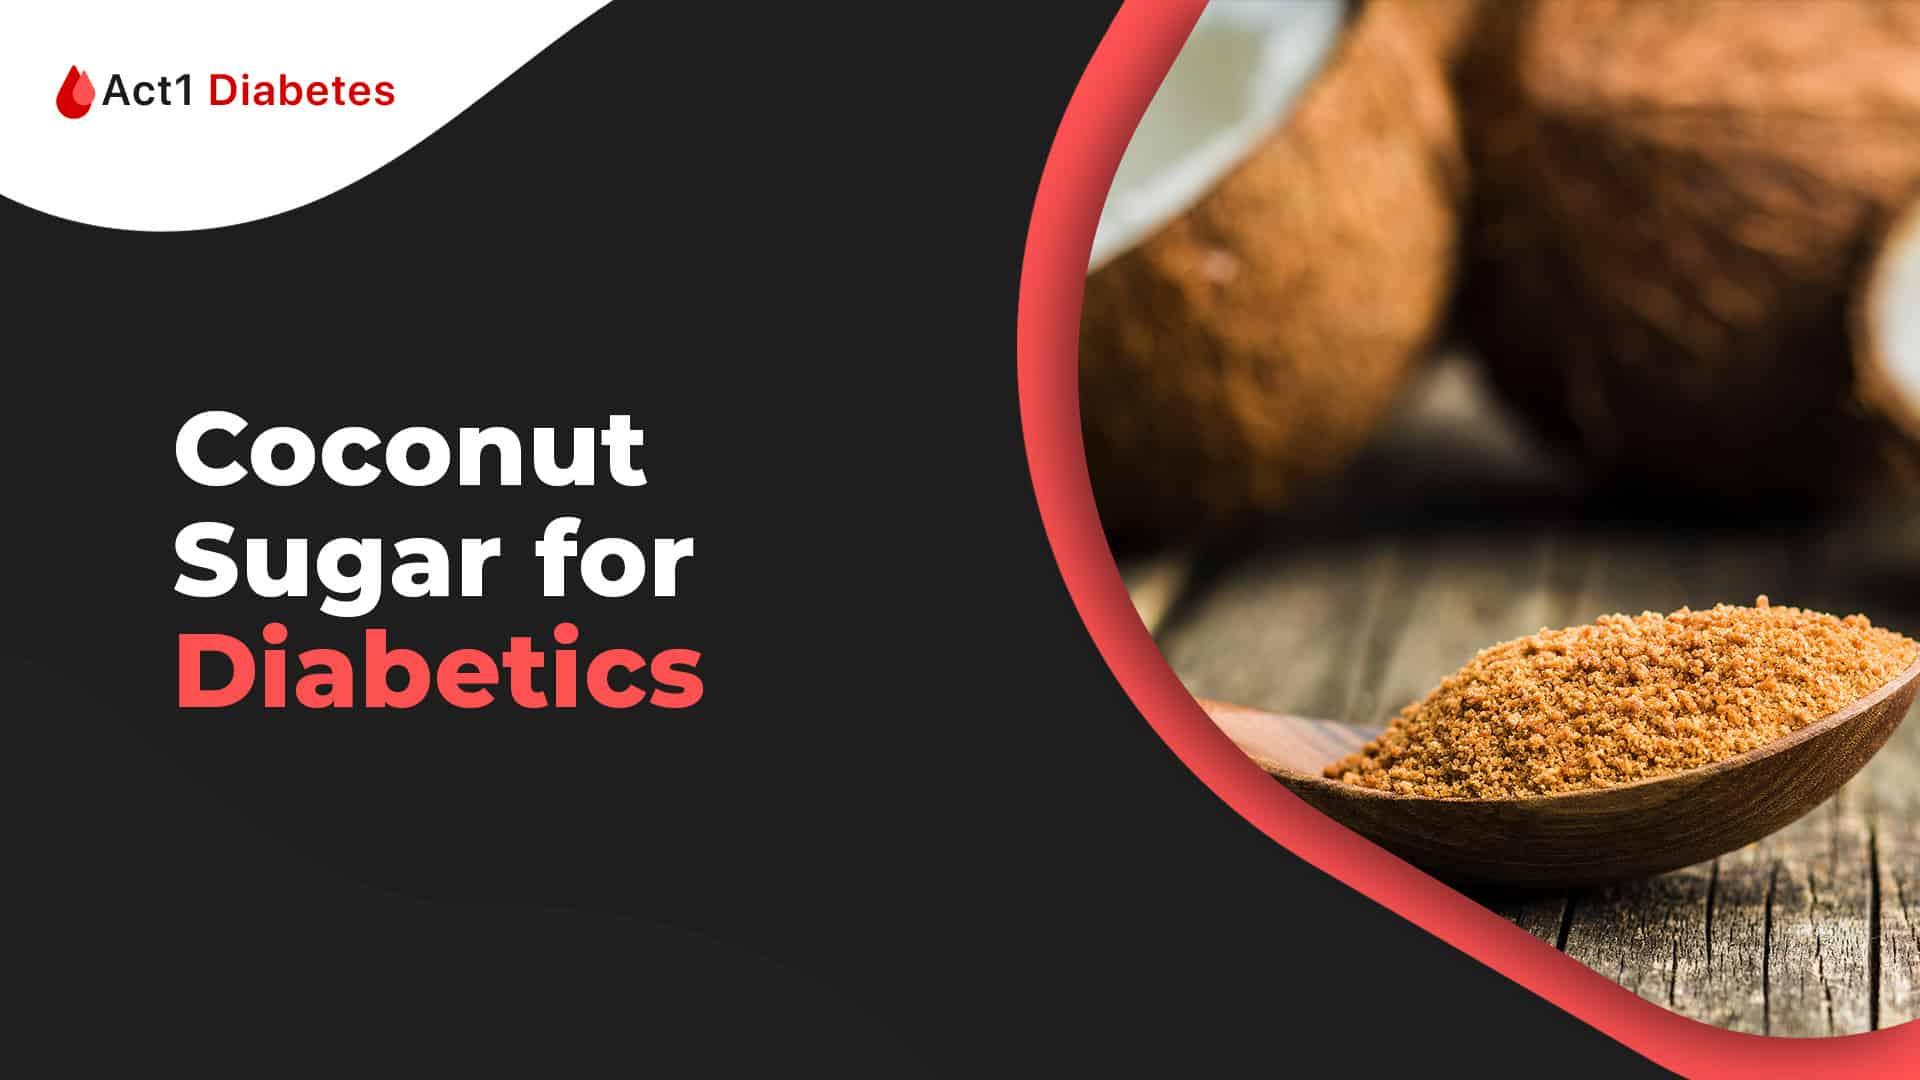 is coconut sugar good for diabetics?